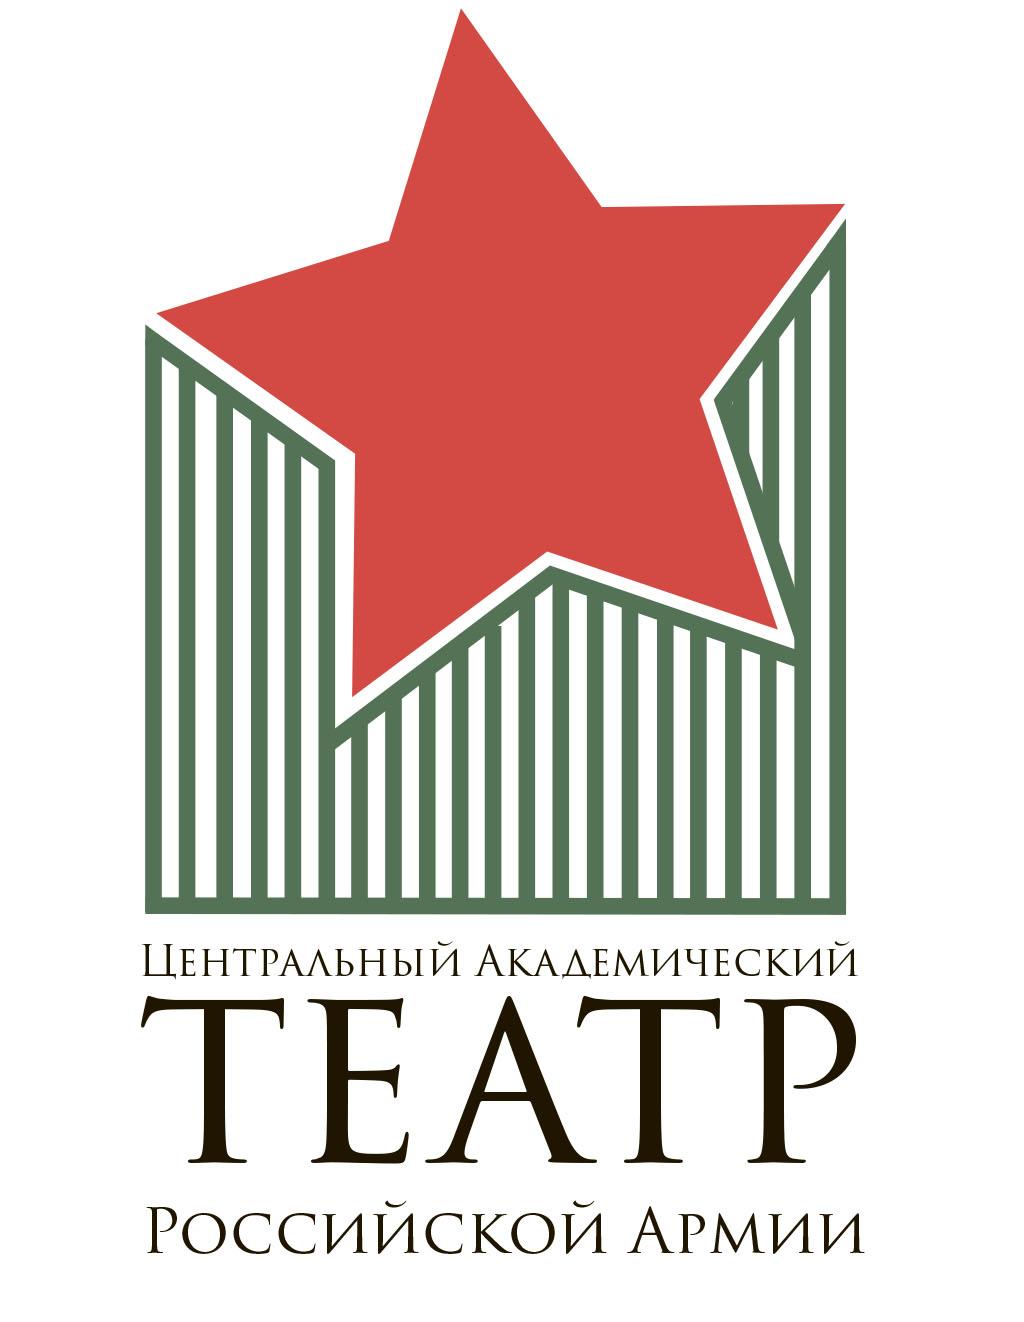 Разработка логотипа для Театра Российской Армии фото f_92358861db46ff8b.jpg